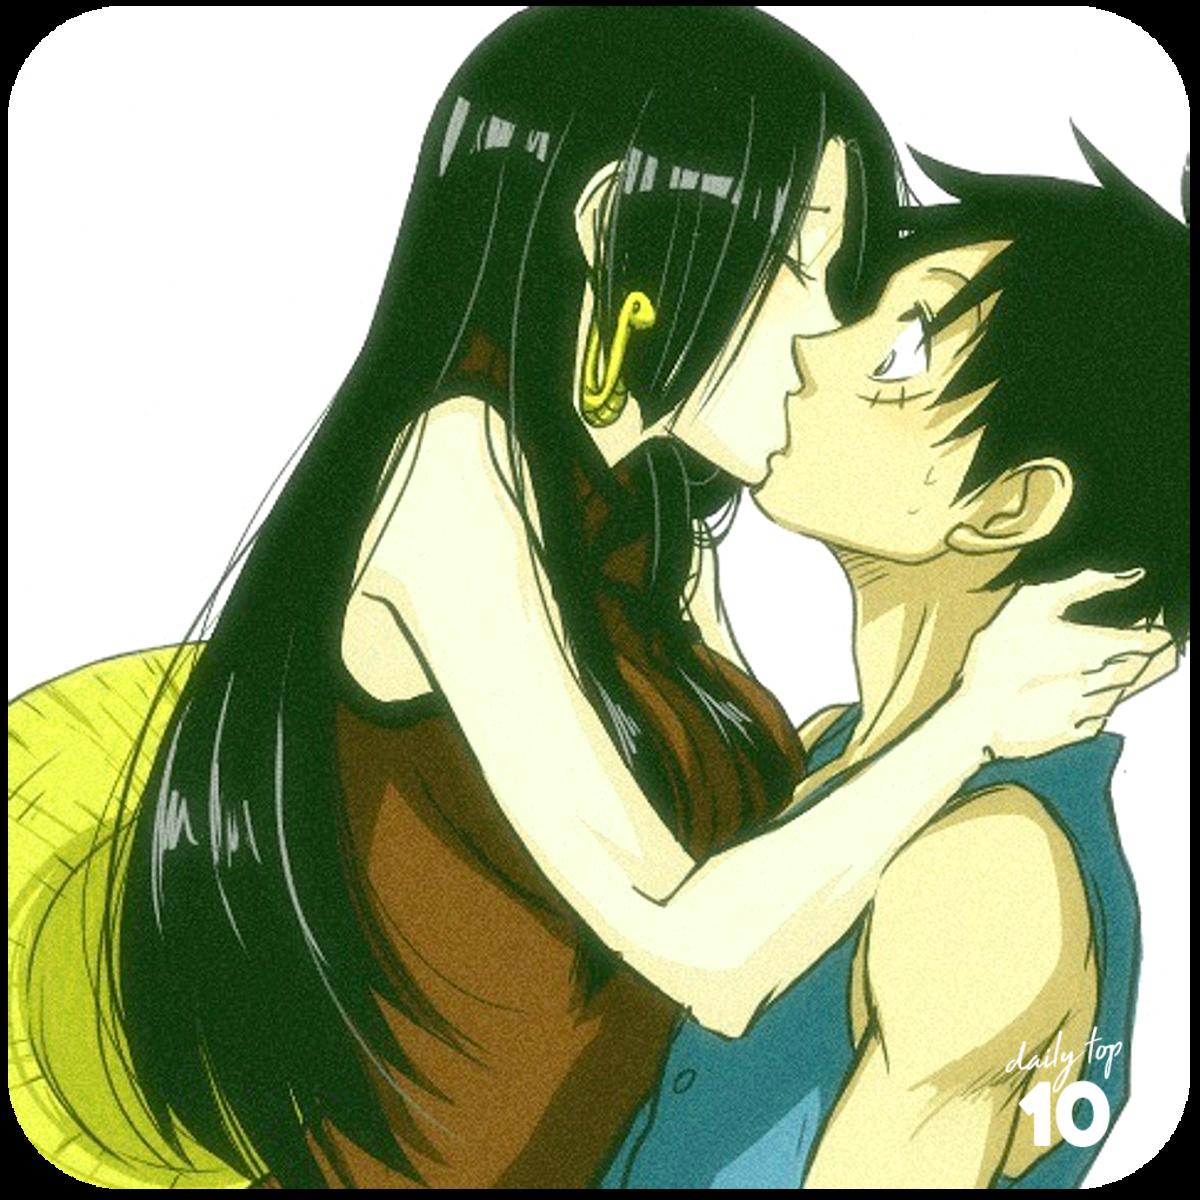 Luffy and Boa Hancock kissing